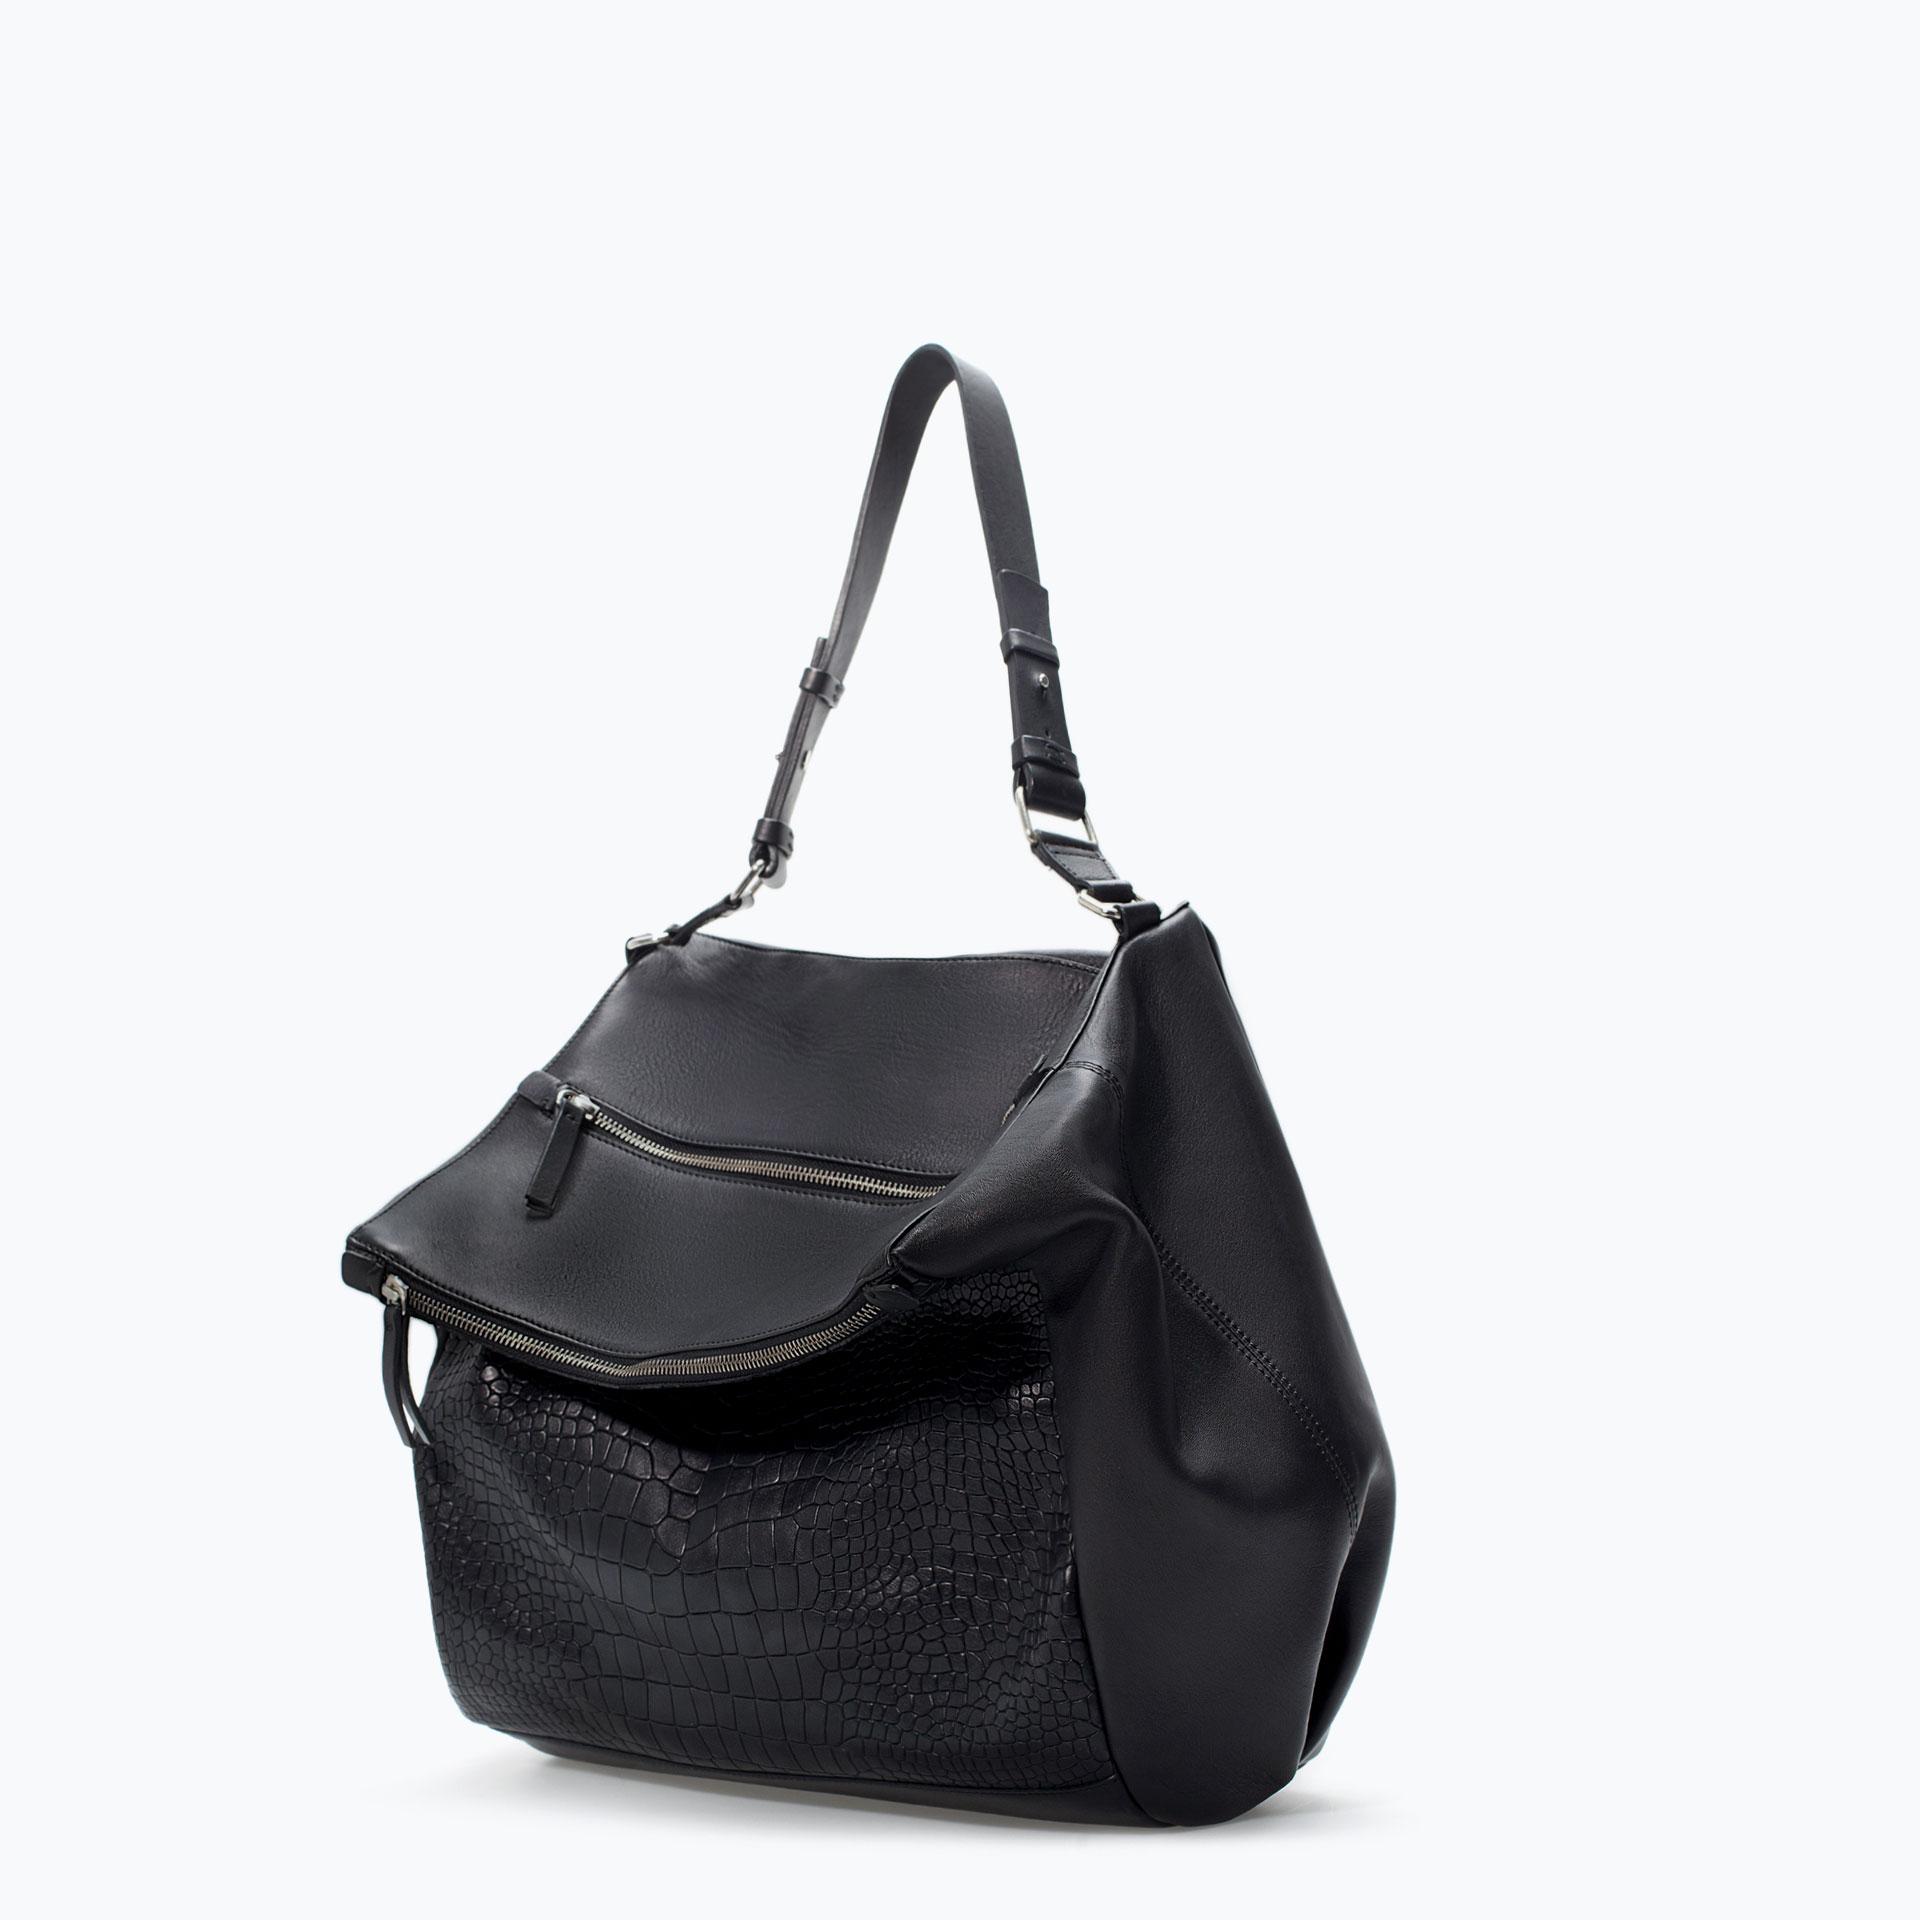 1f8a5a8eee Zara Zip Applique Leather Bucket Bag in Black